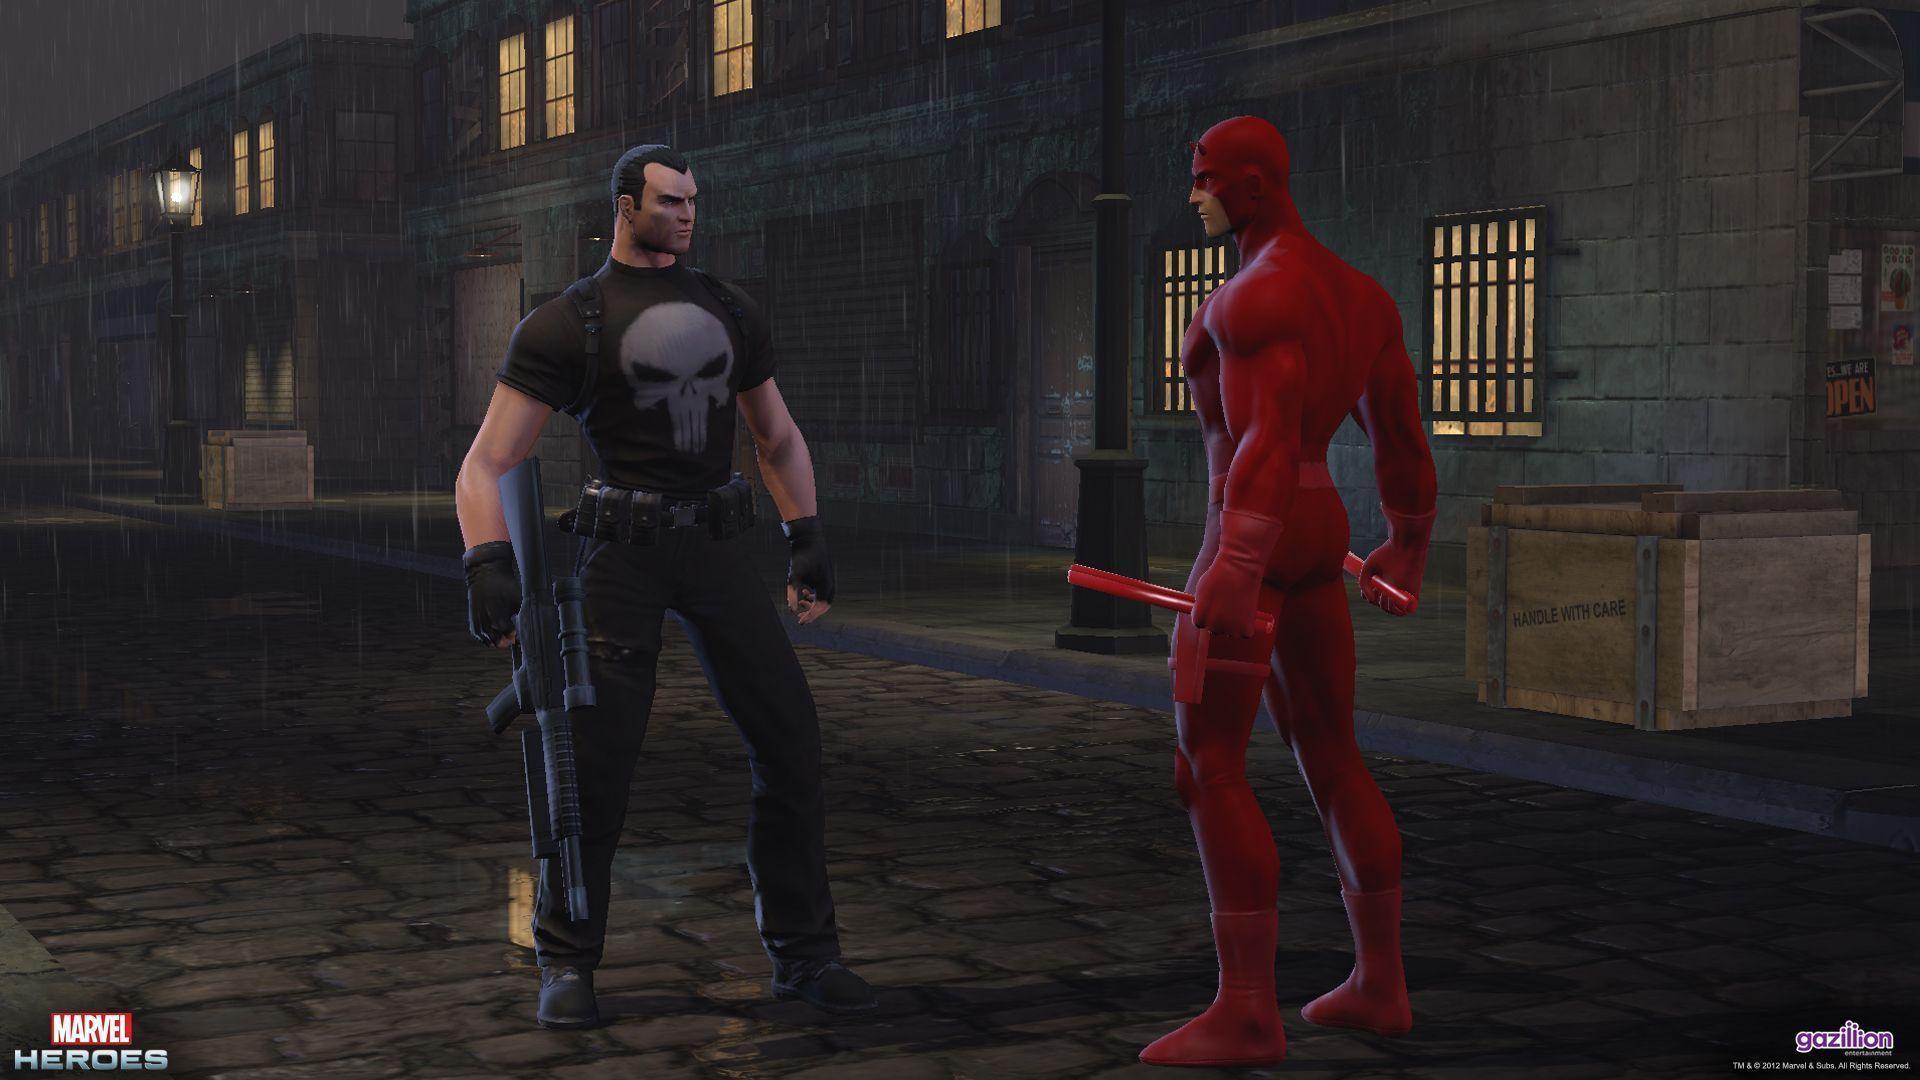 Daredevil Movie Wallpaper - Viewing Gallery